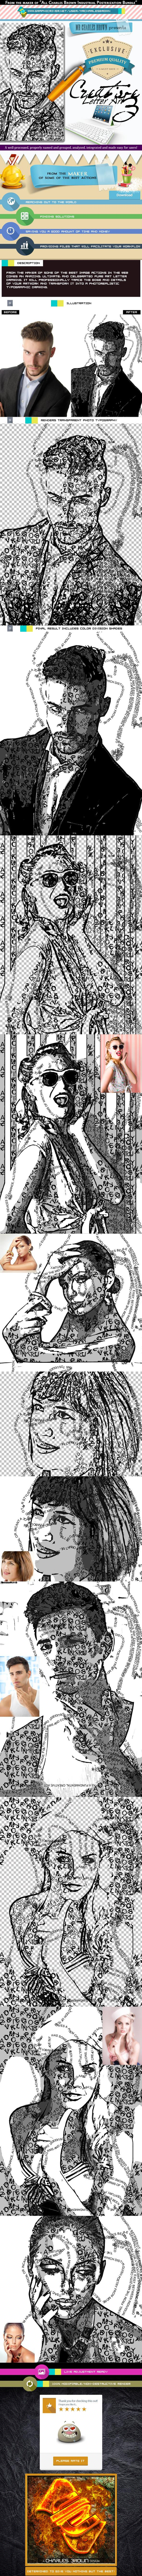 Creative Letter Art 3 – Transparent - Photo Effects Actions